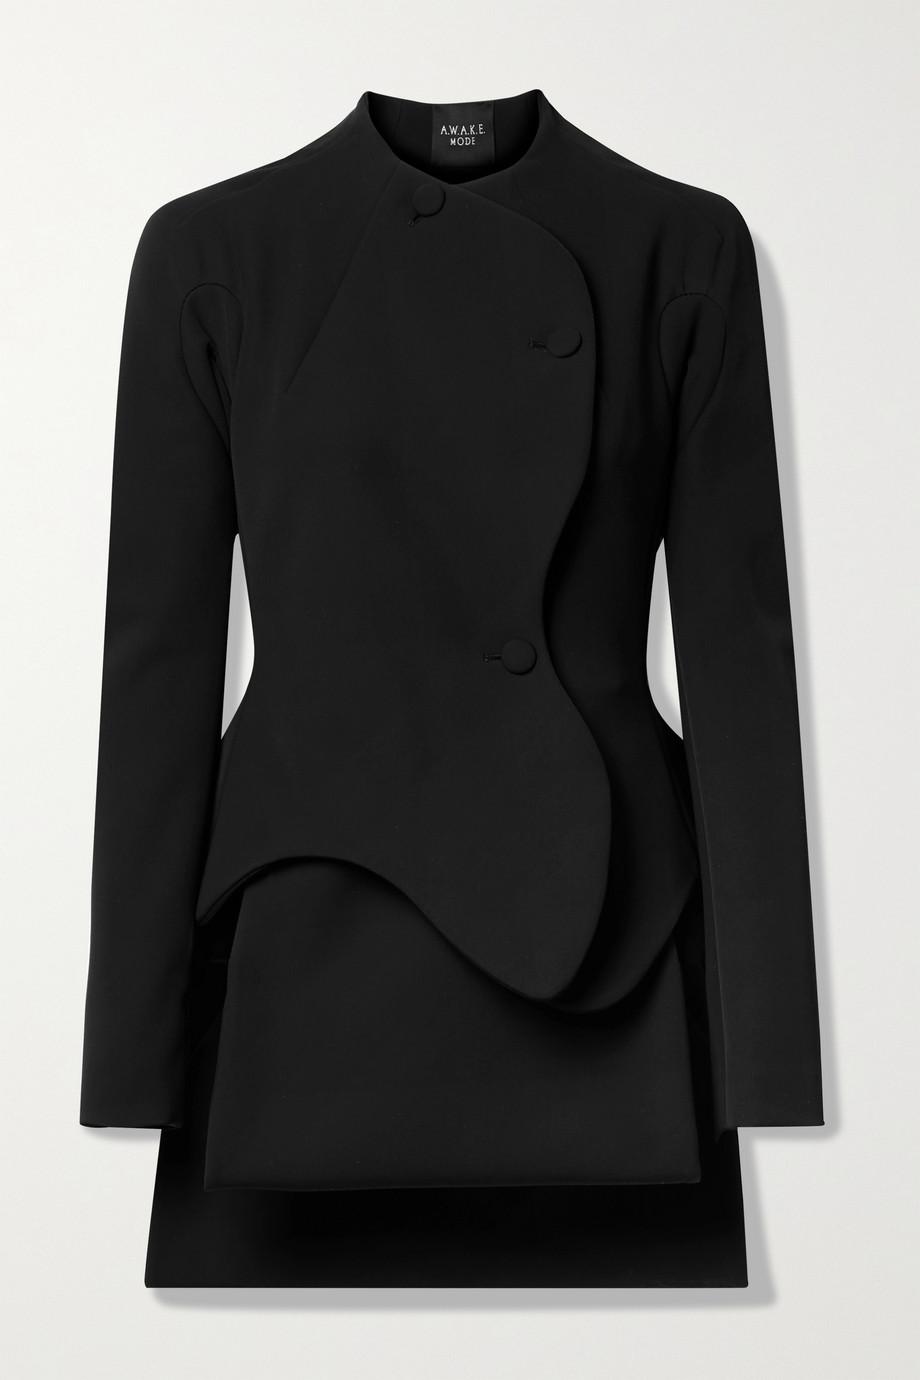 A.W.A.K.E. MODE Layered stretch-cady jacket